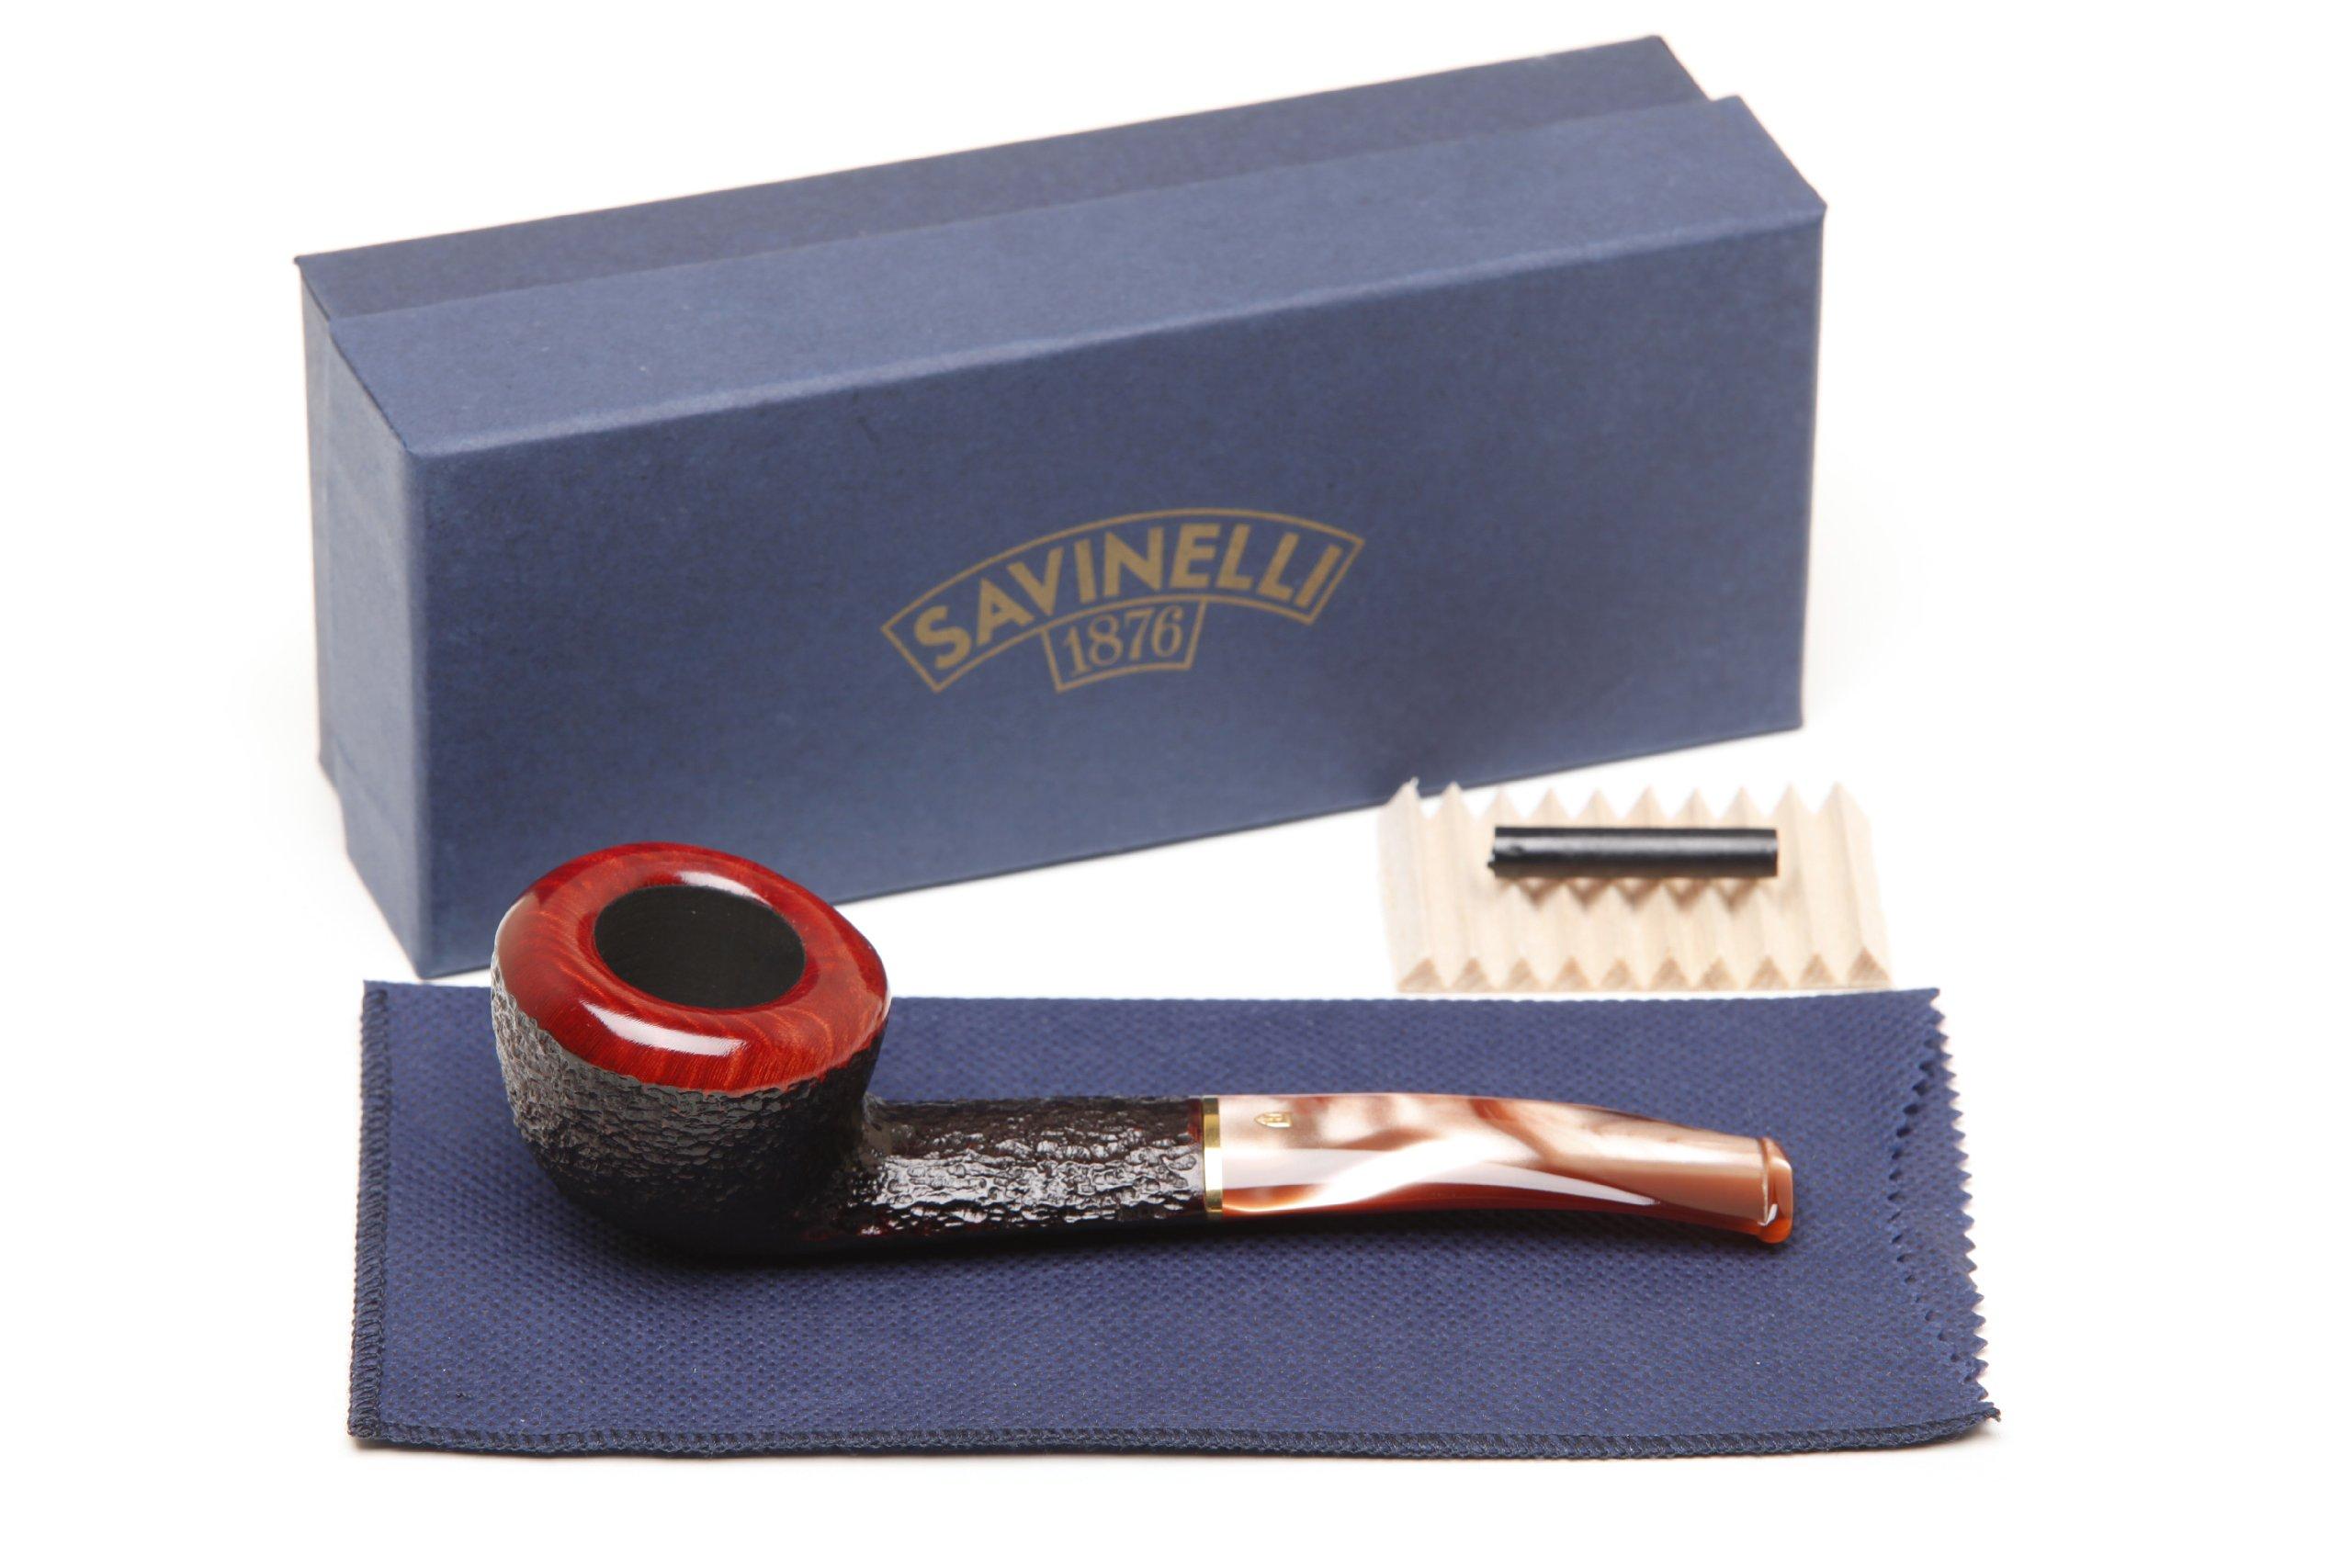 Savinelli Roma Rustic 316 KS Lucite Stem Tobacco Pipe